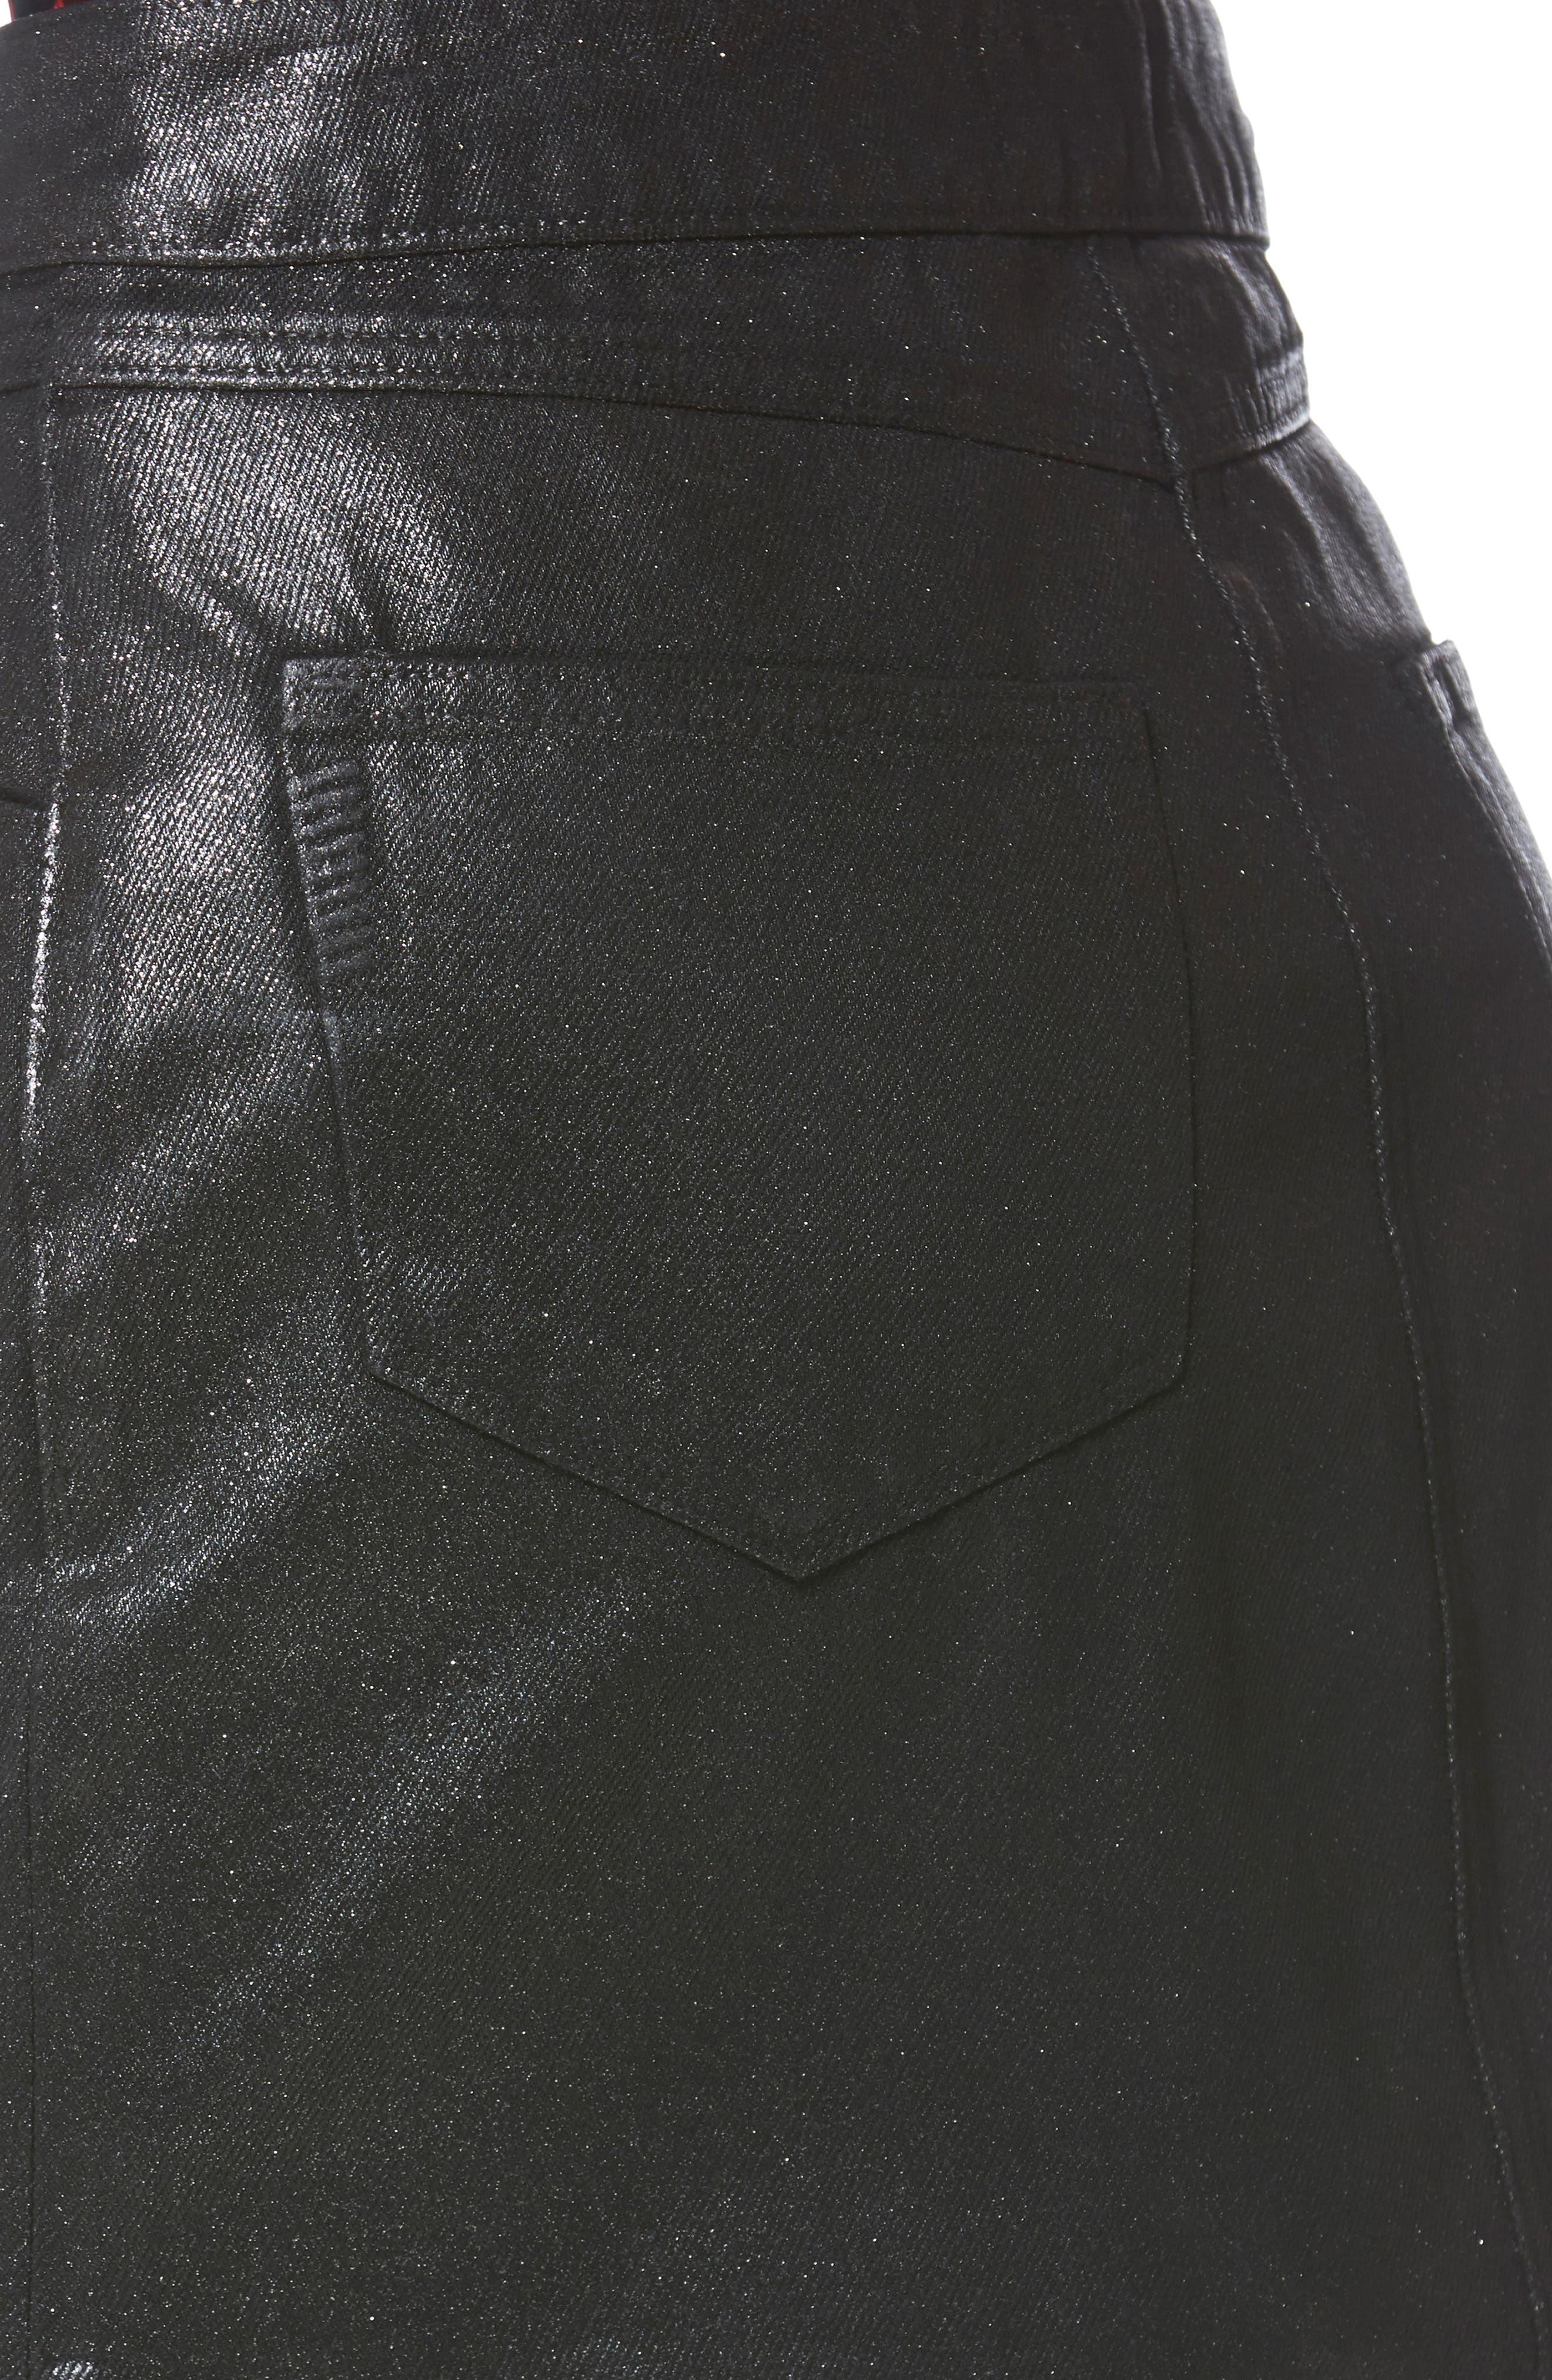 Jamine Zip Front Skirt,                             Alternate thumbnail 6, color,                             SPARKLE COATING